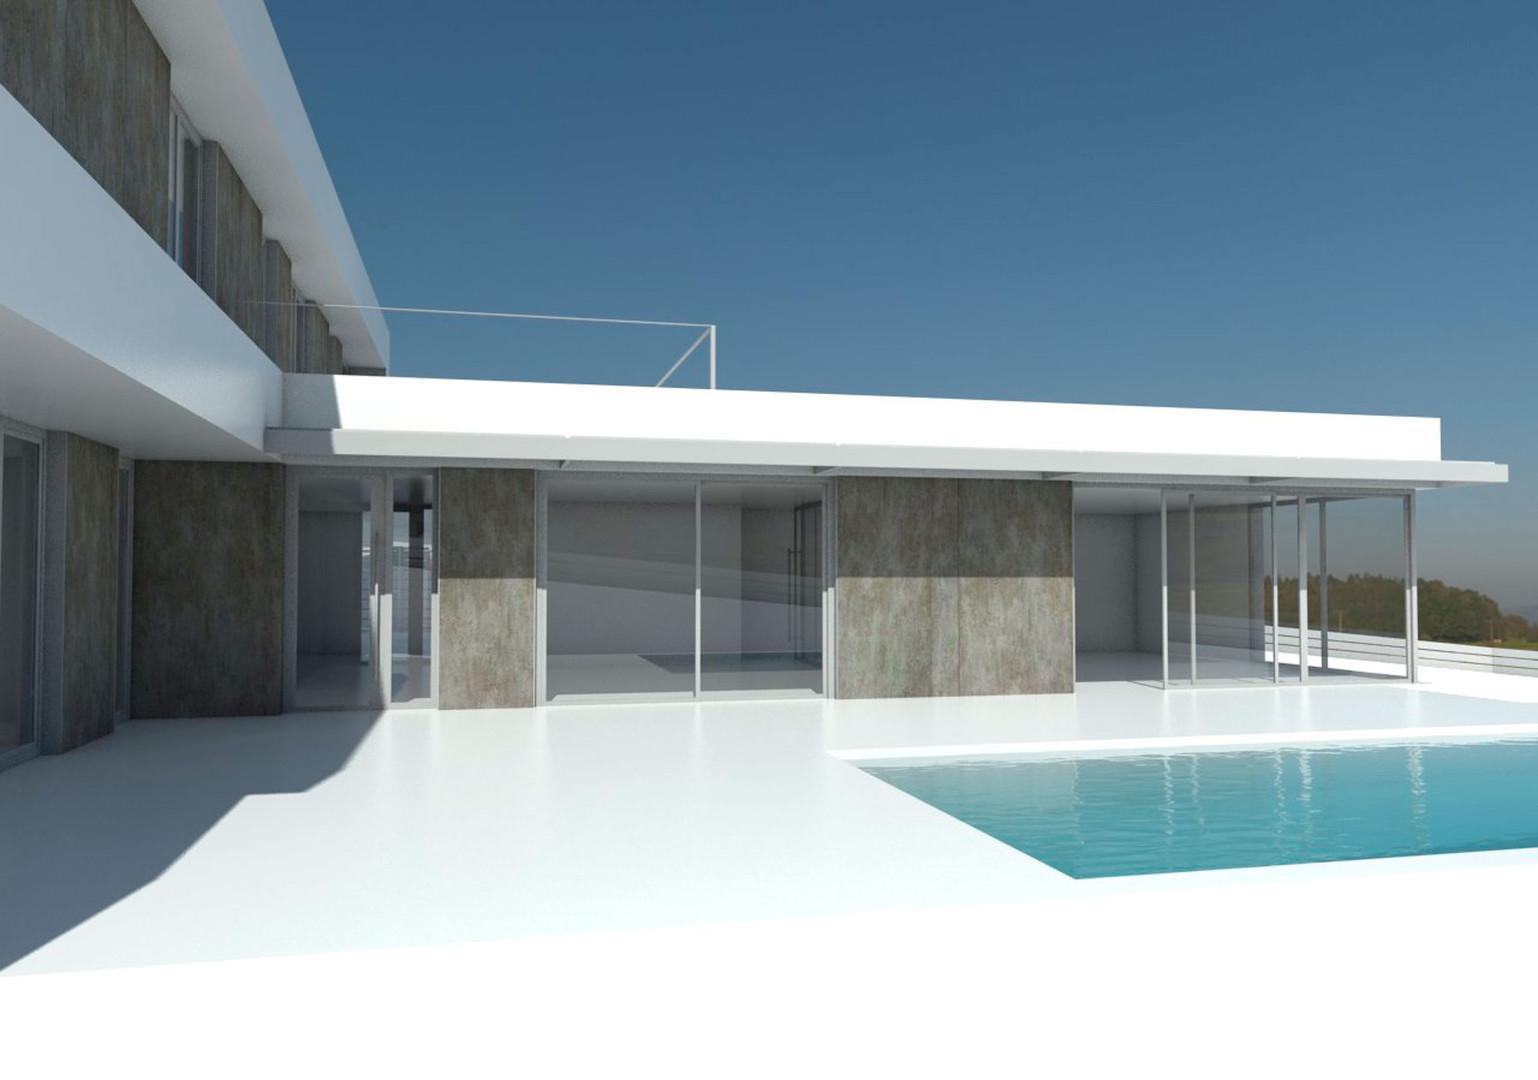 arquitectura-senmais-16.02.03.jpg